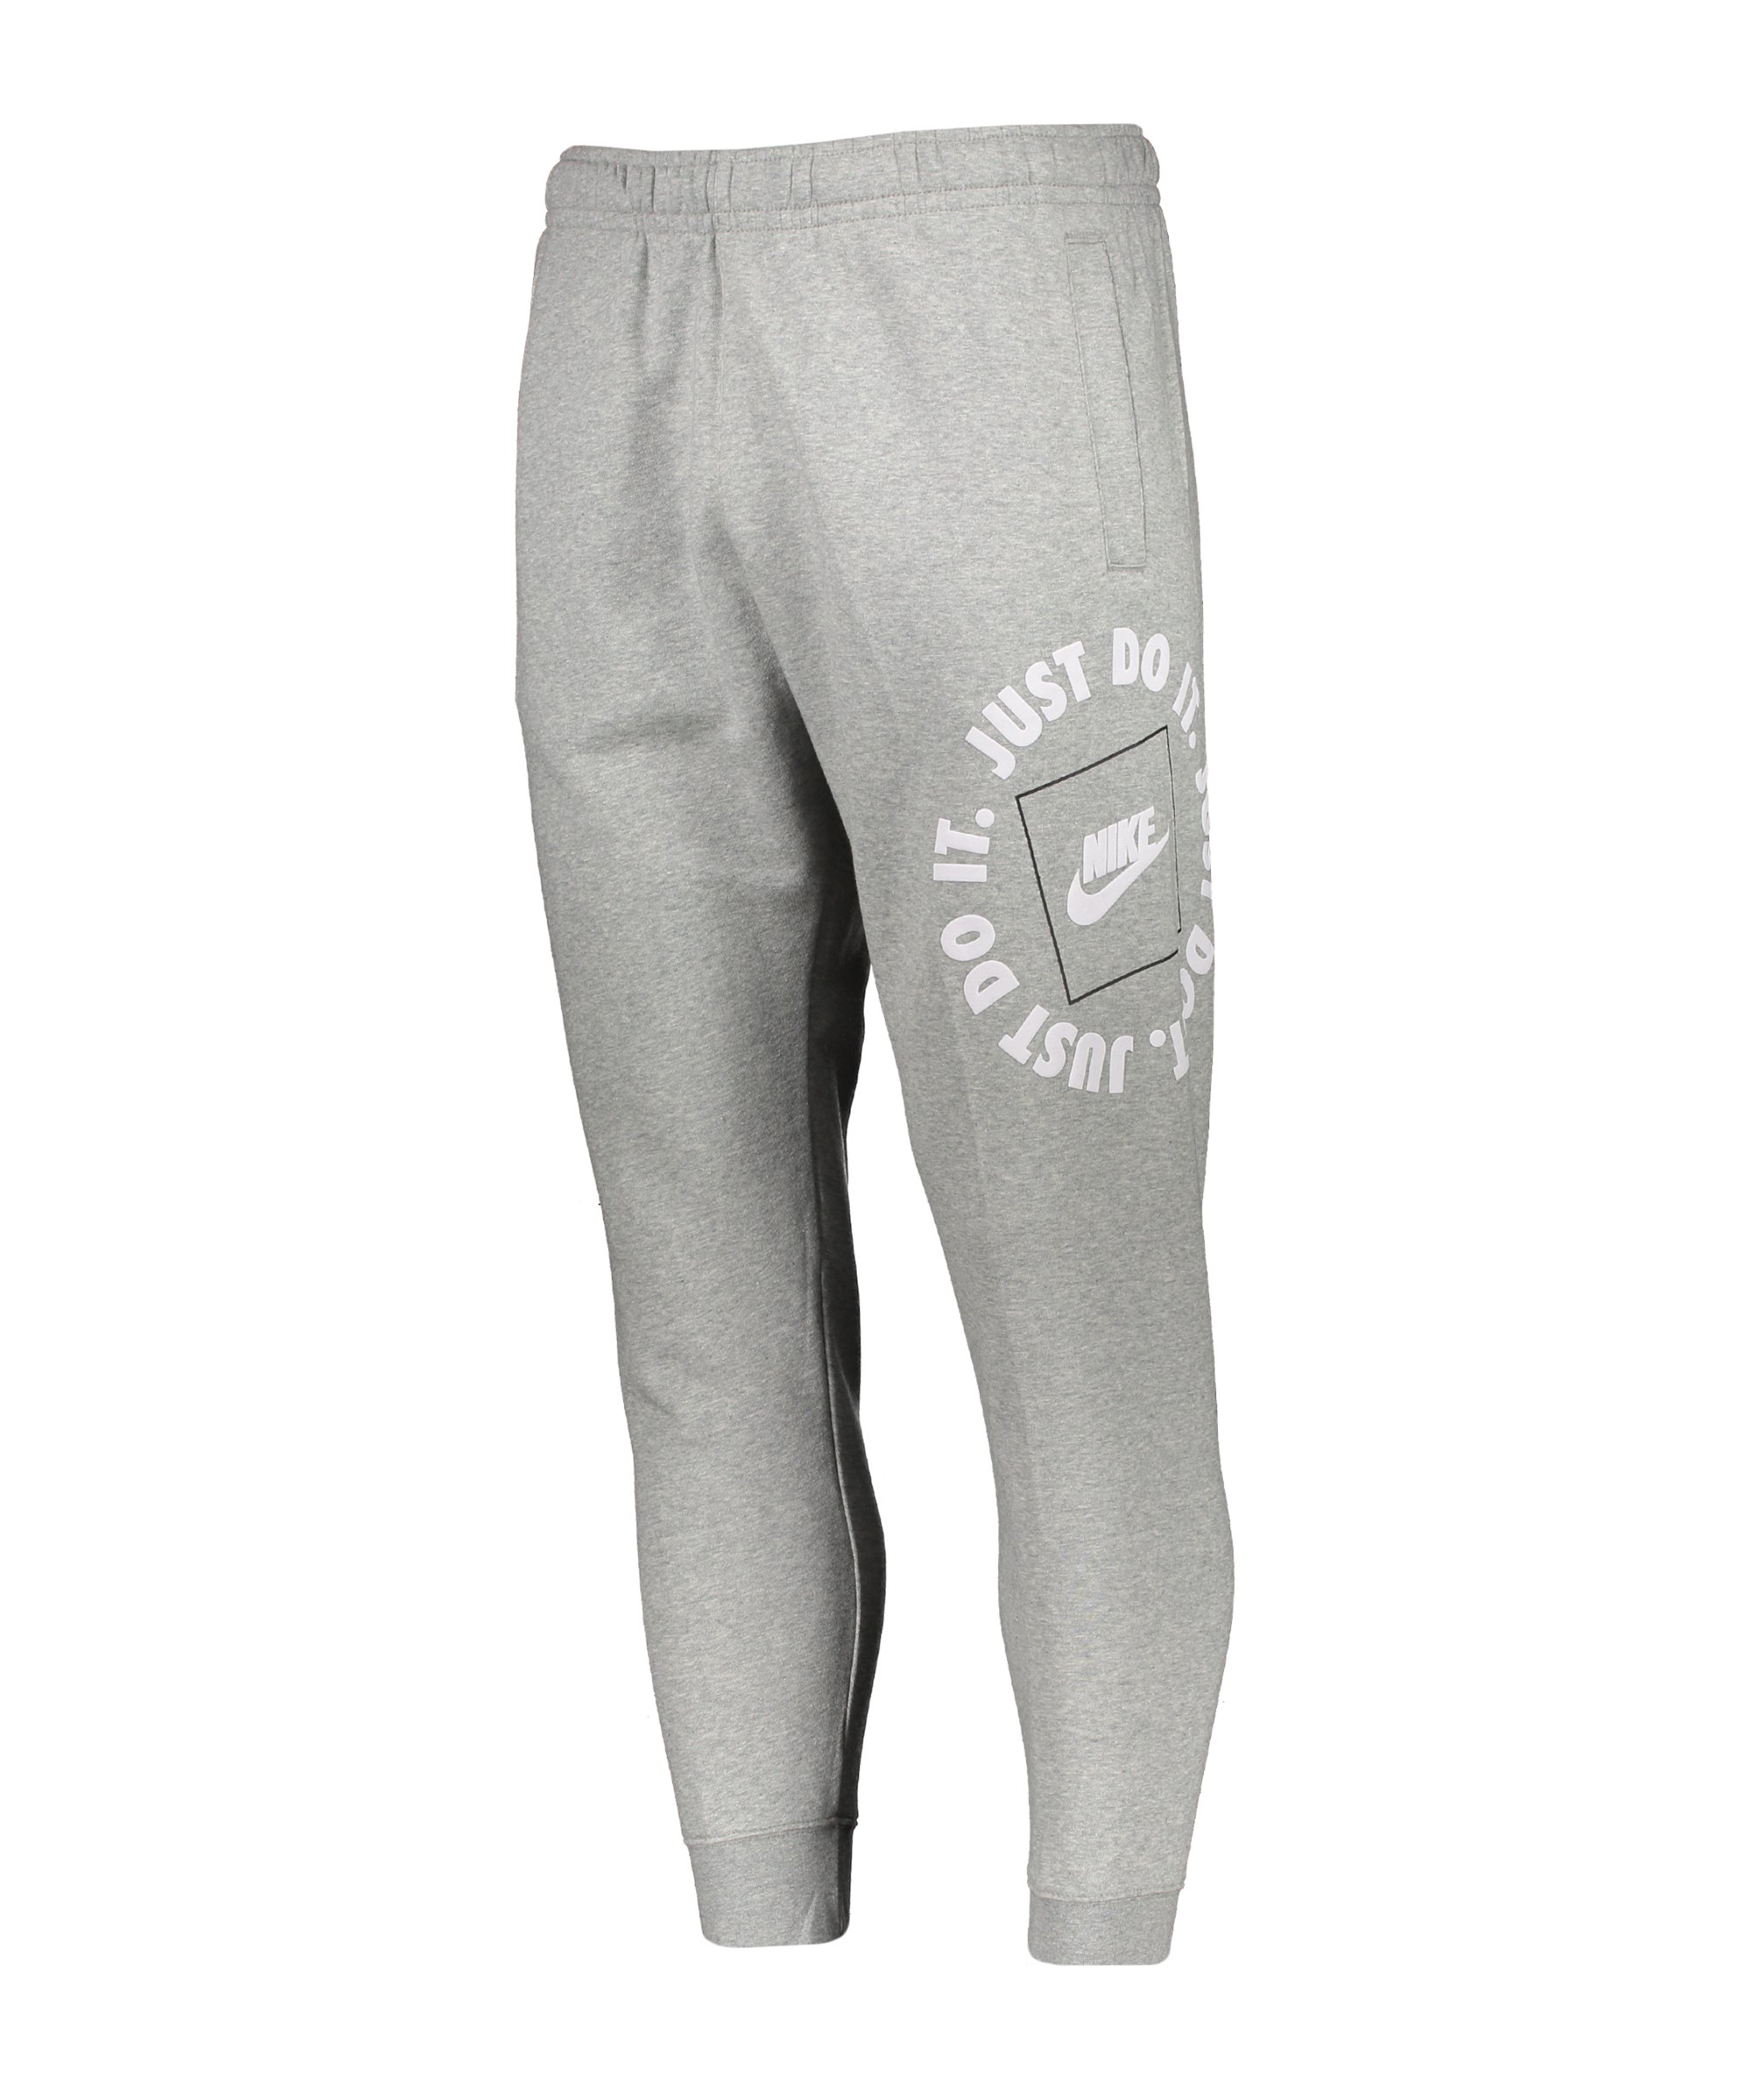 Nike Just Do It Fleece Jogginghose Grau F063 - grau